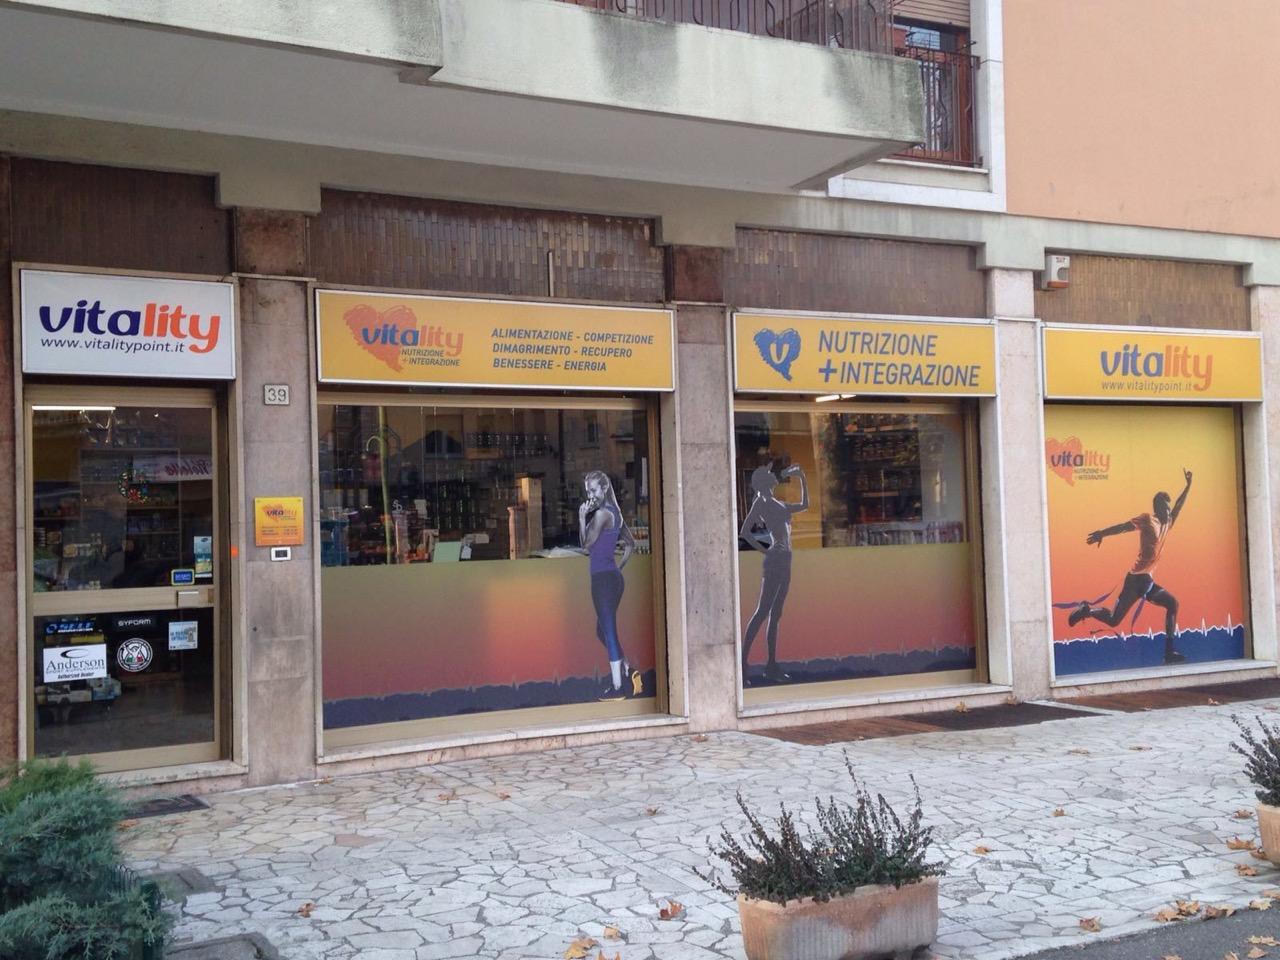 Vetrine Vitality Brescia